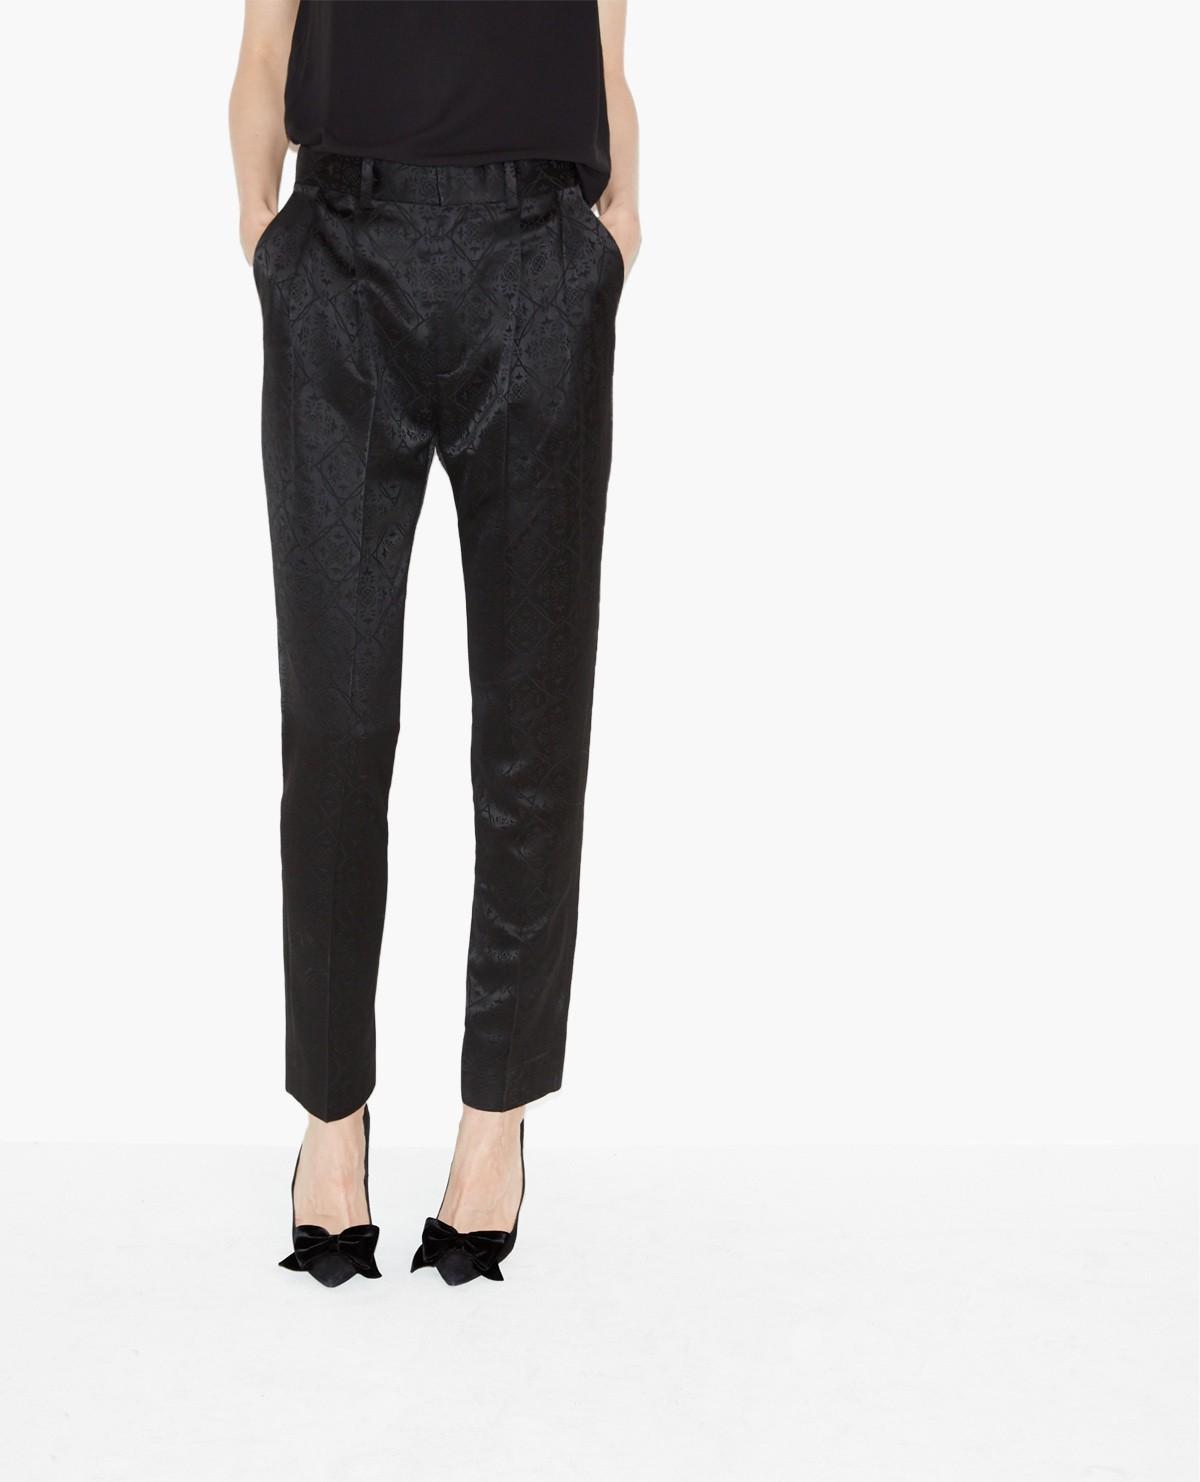 The Kooples - pantalon (195 €)